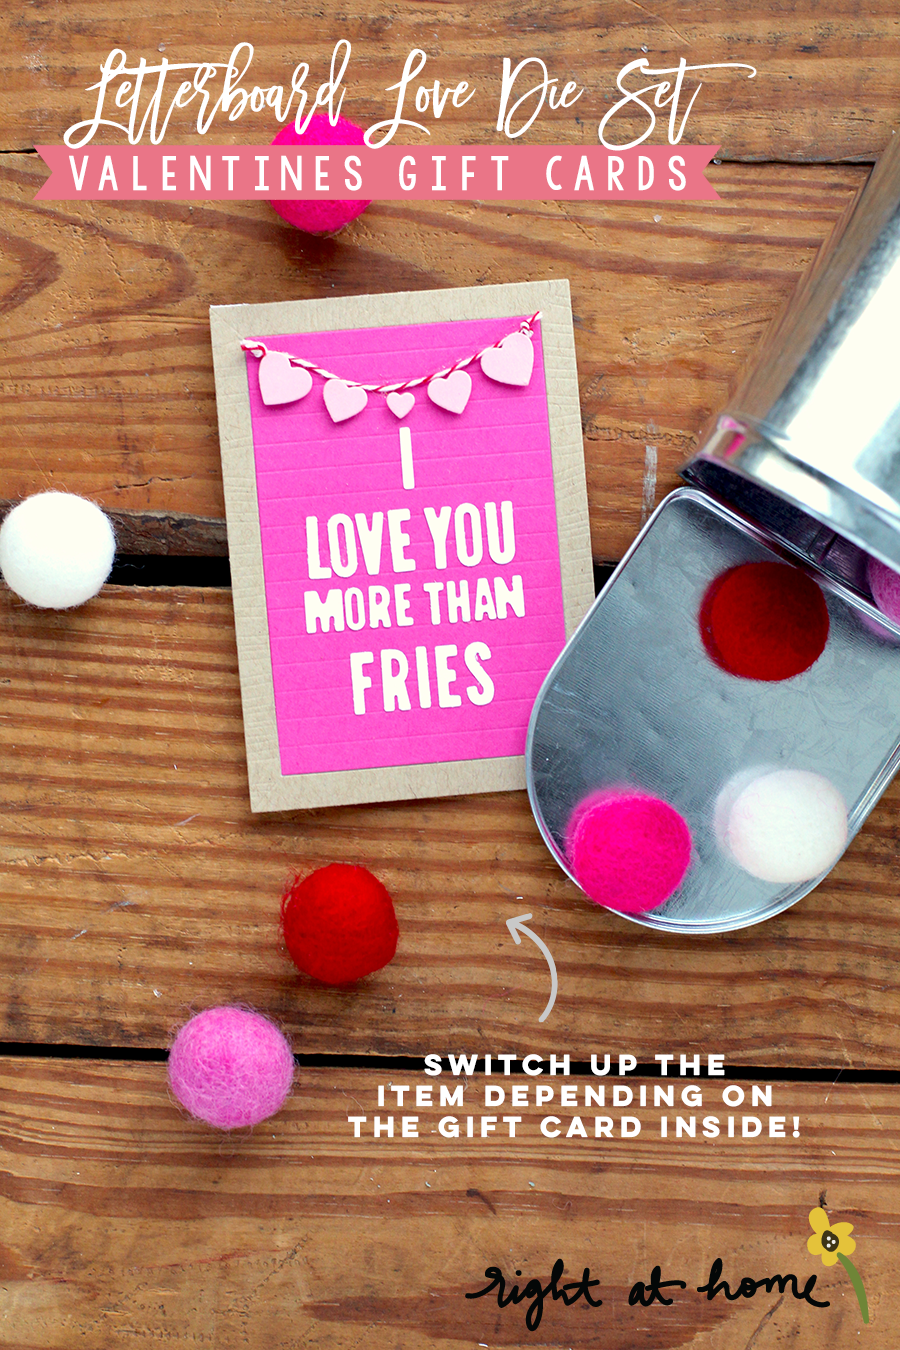 Day #3: Letterboard Love Die Set Valentines Gift Cards // rightathomeshop.com/blog